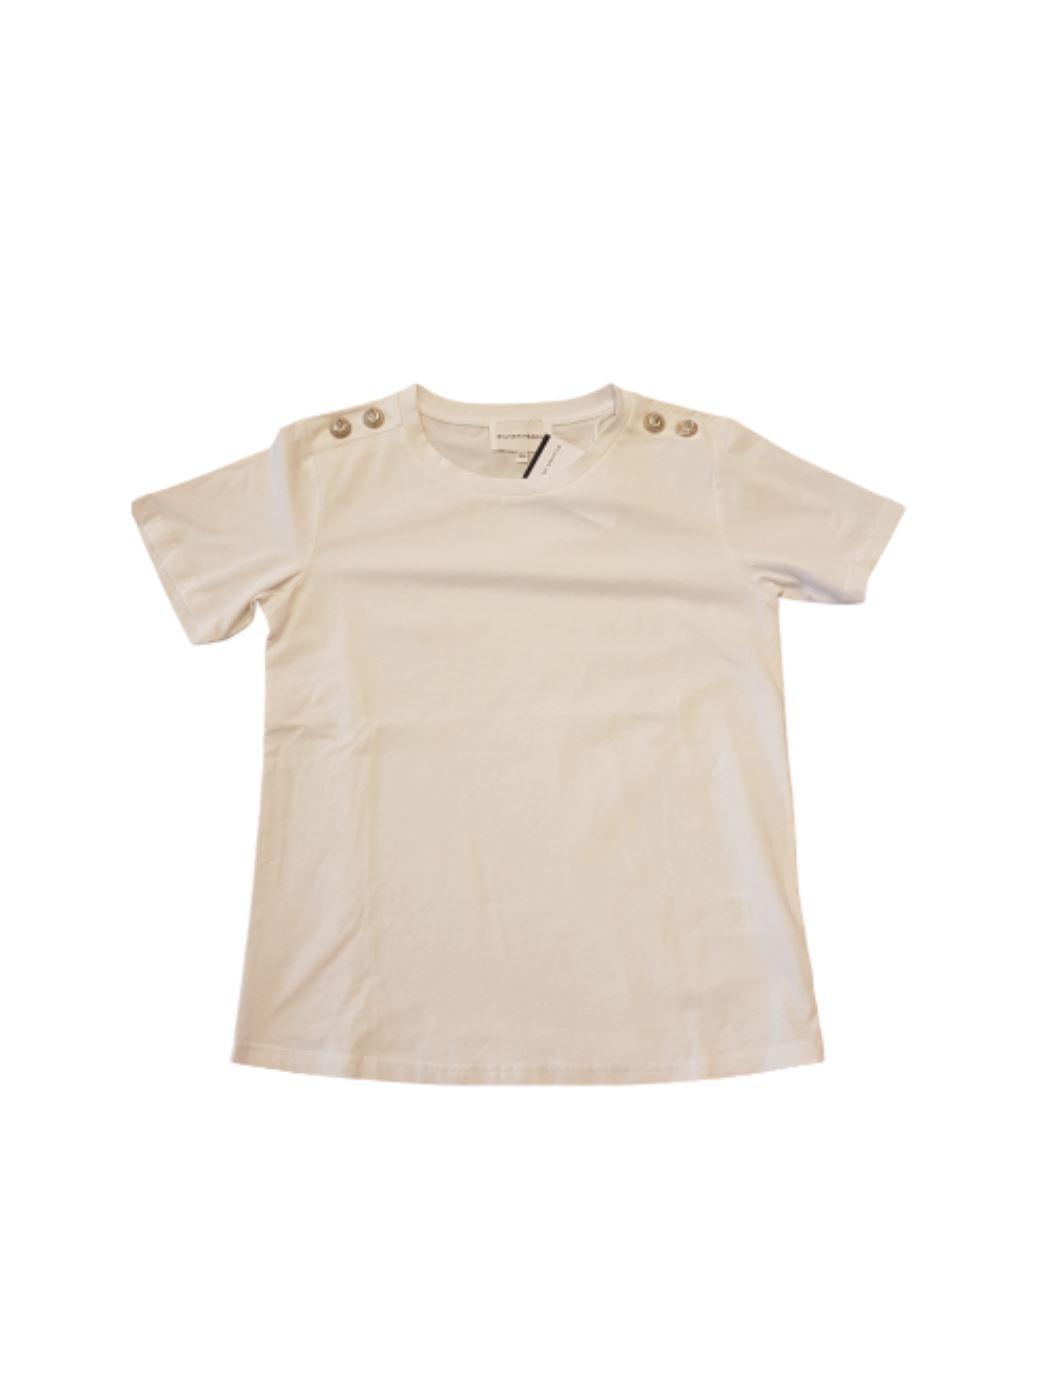 SILVIAN HEACH T-shirt fishriver bianca PGP20380TSFE